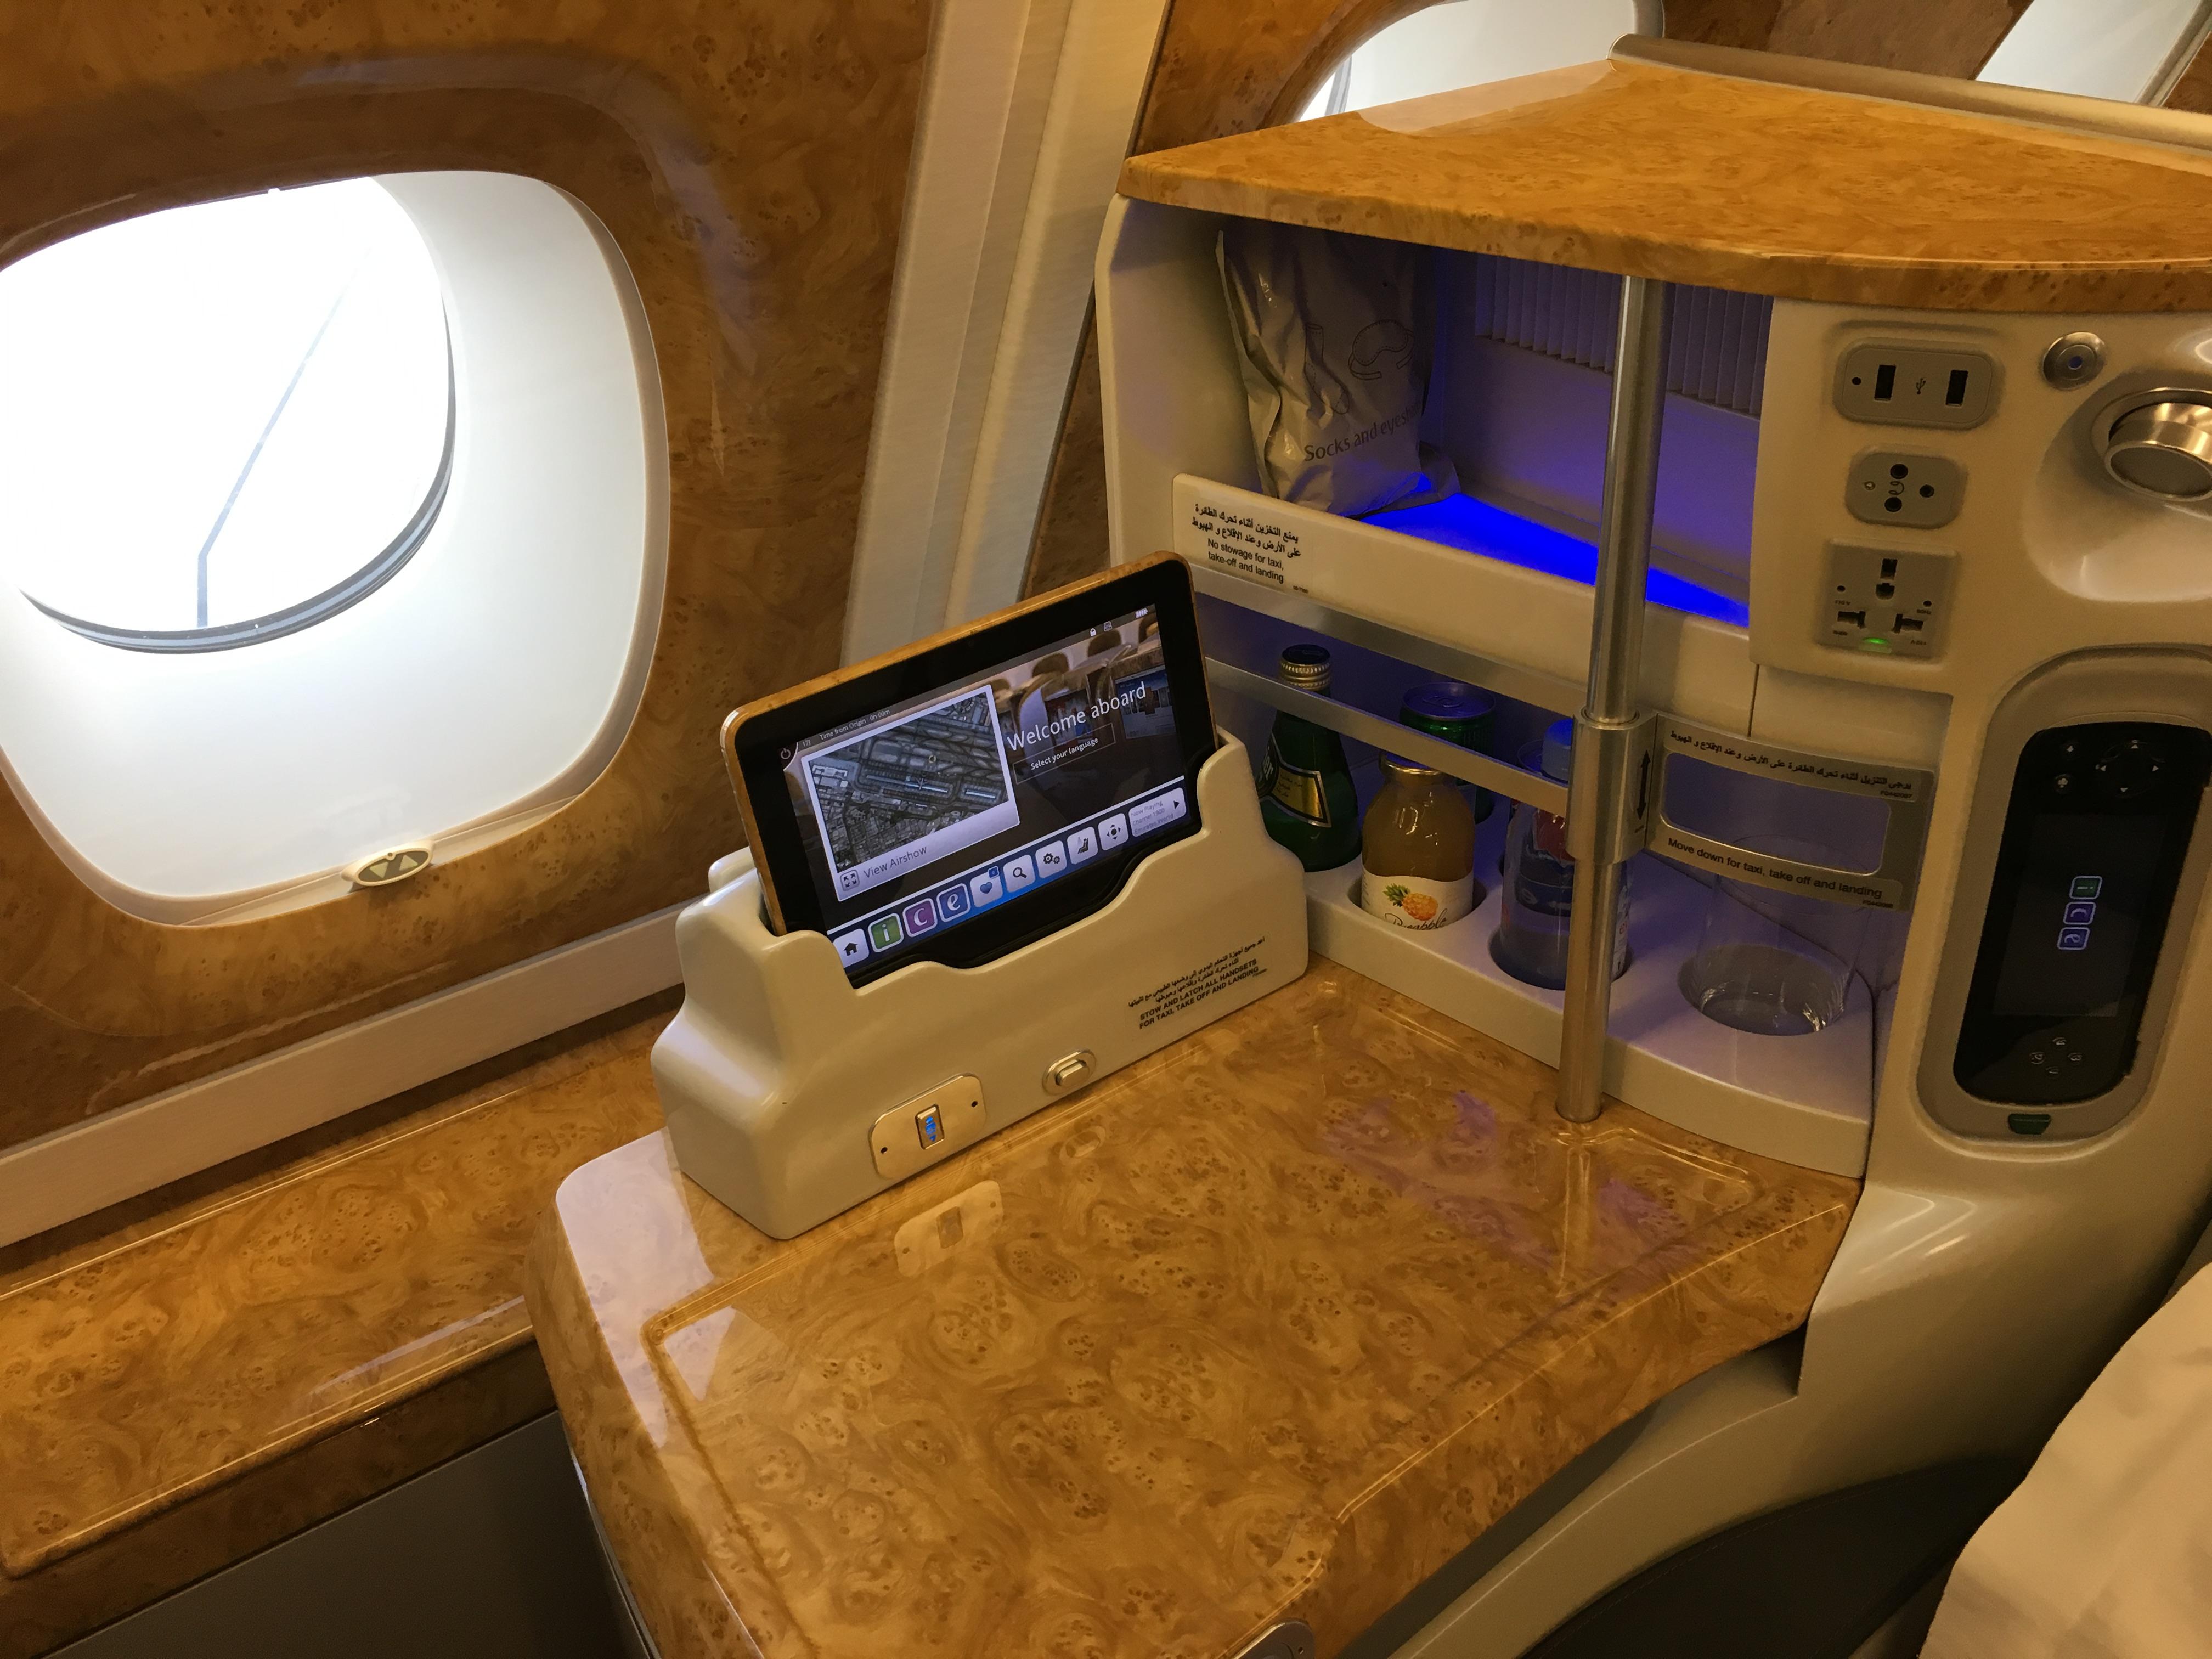 Business Class Review : エミレーツ航空(EK) EK751 ドバイ(DXB) – カサブランカ(CMN) Airbus A380-800